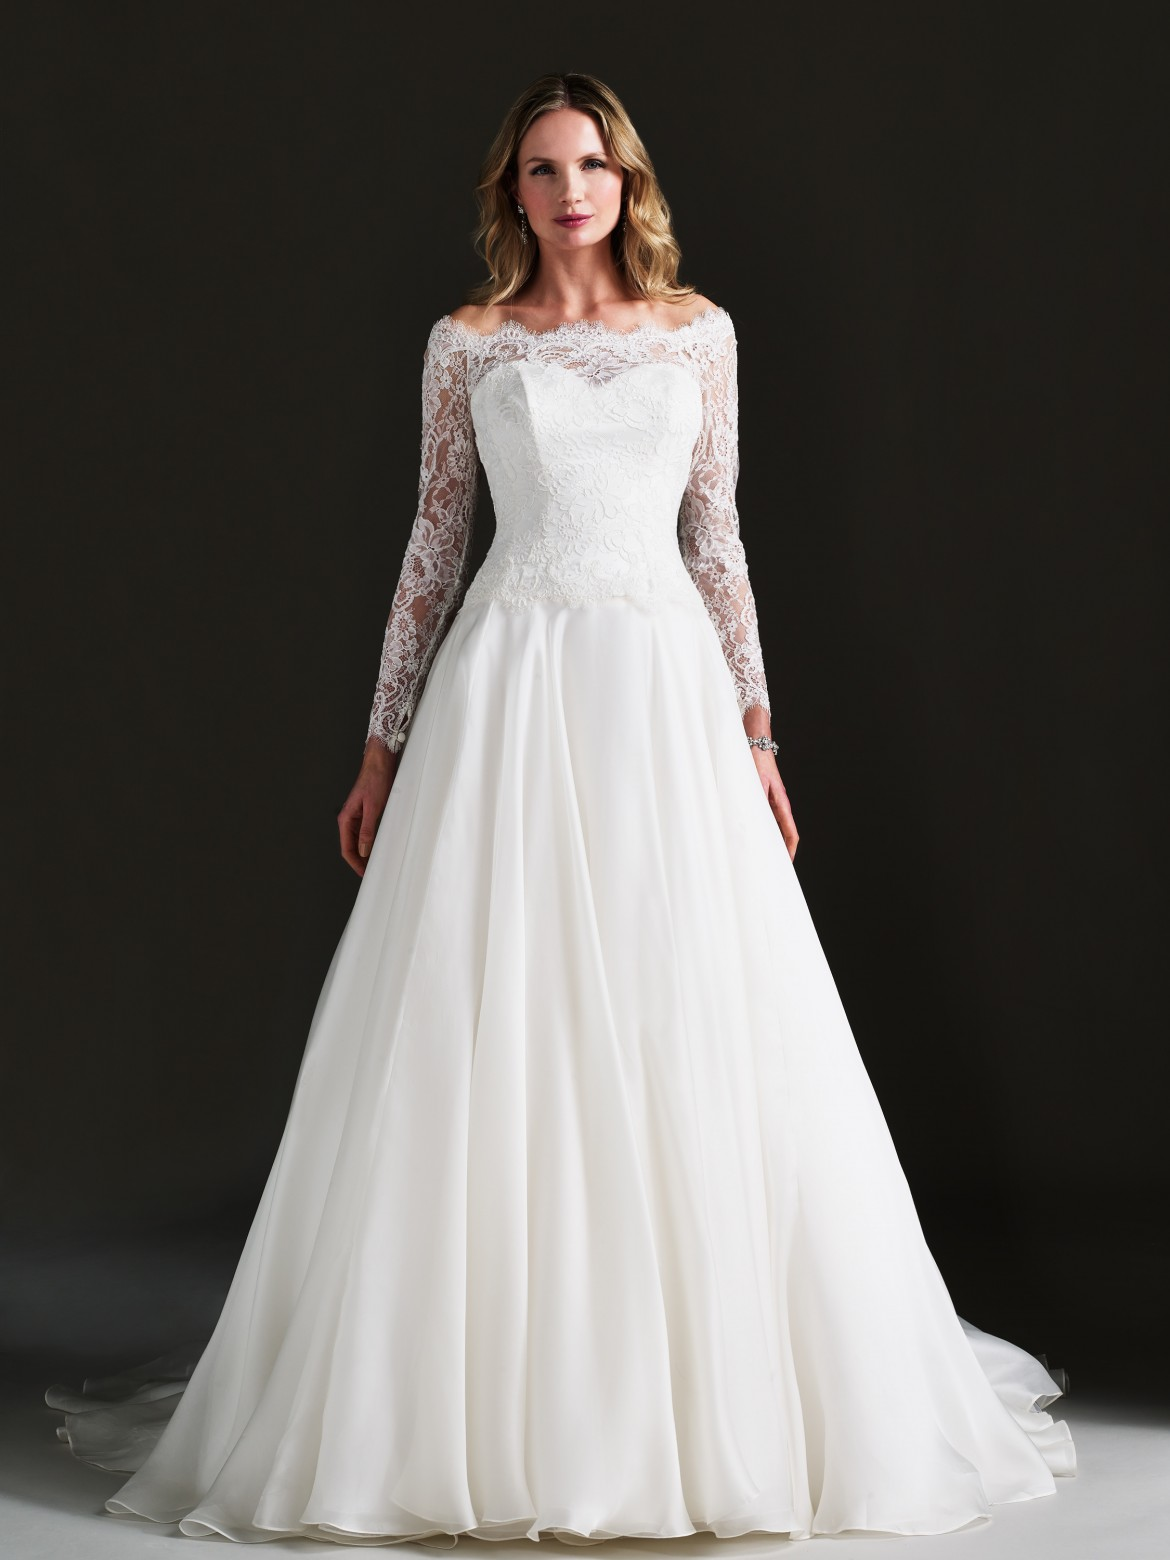 CARINA BAVERSTOCK BRIDAL DESIGNER WEDDING DRESS EVENT – 13TH ...